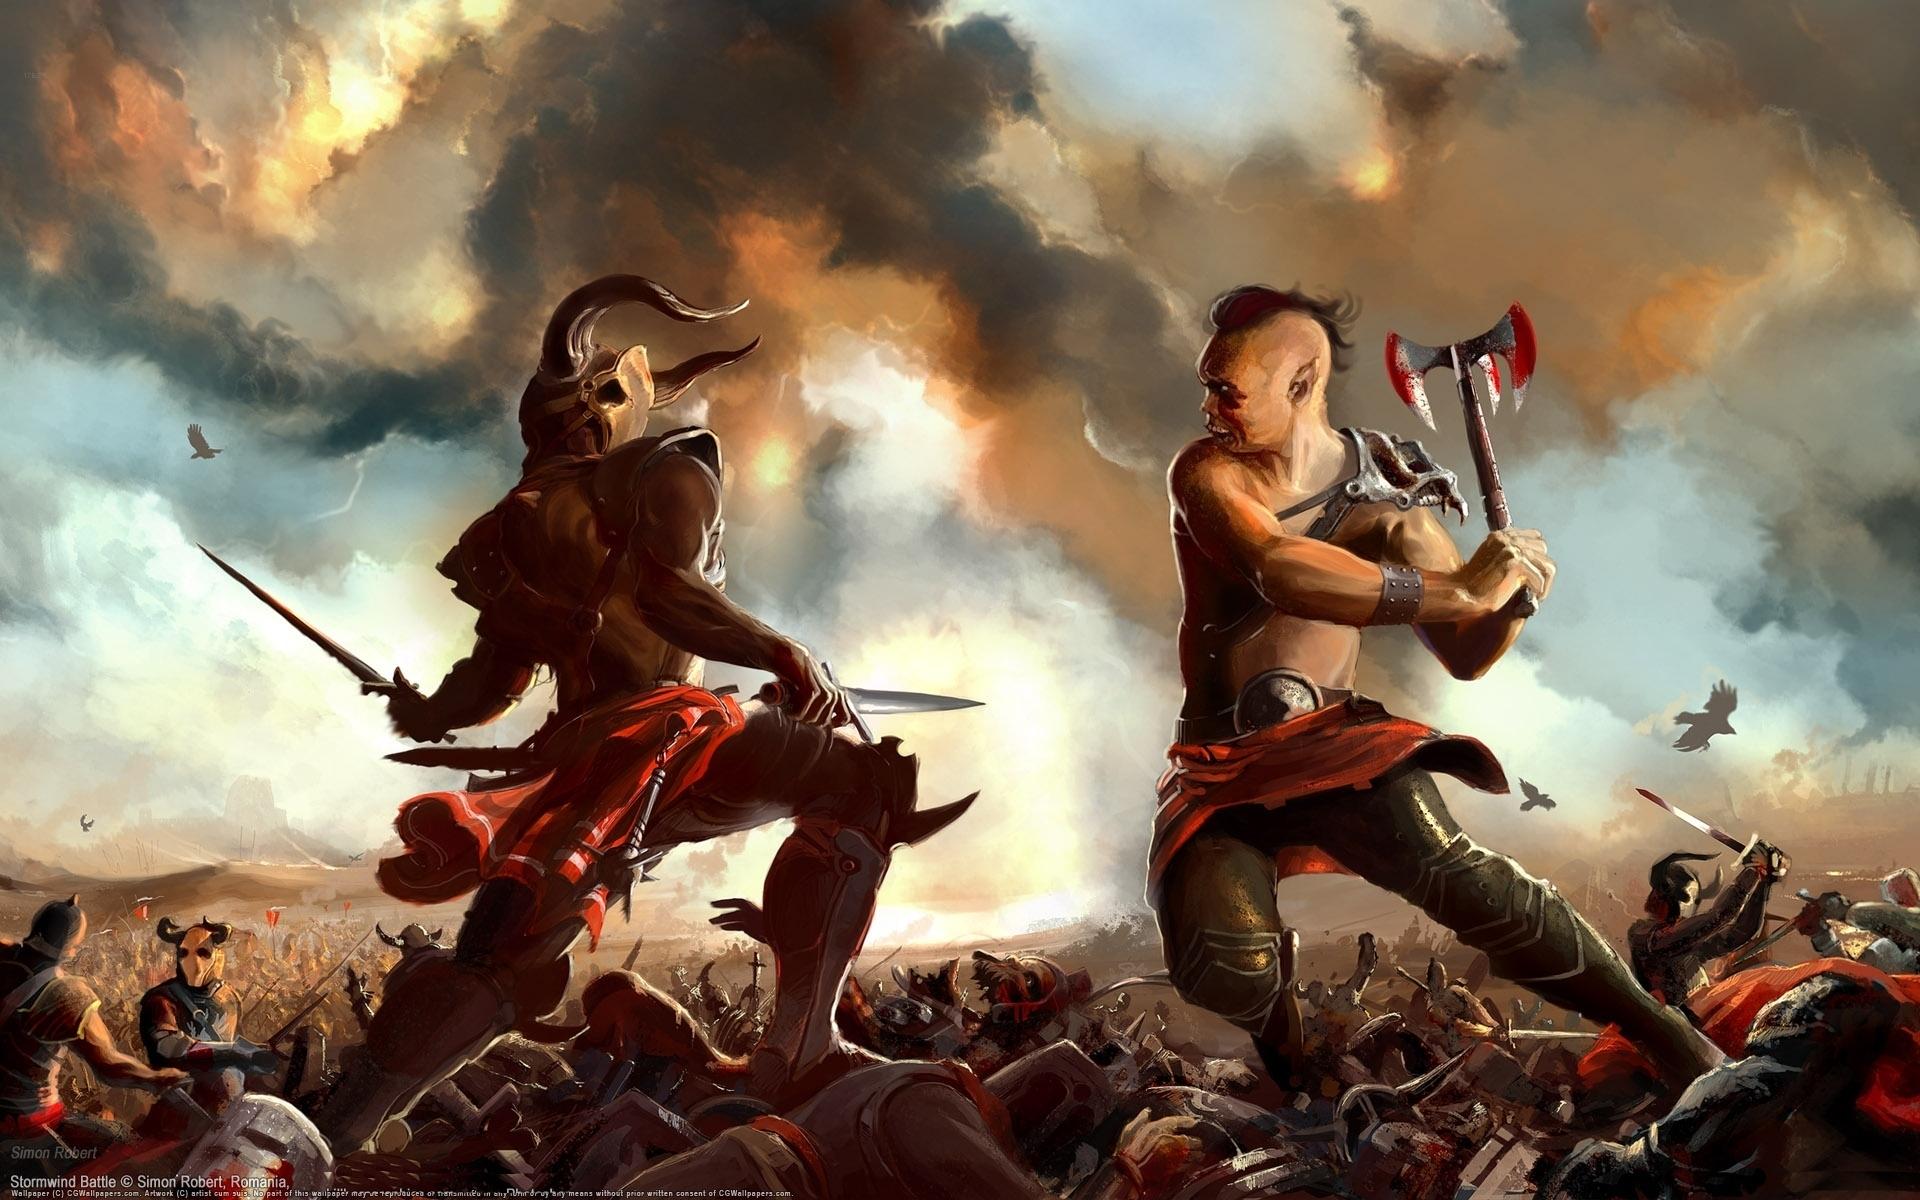 Battle Backgrounds on Wallpapers Vista